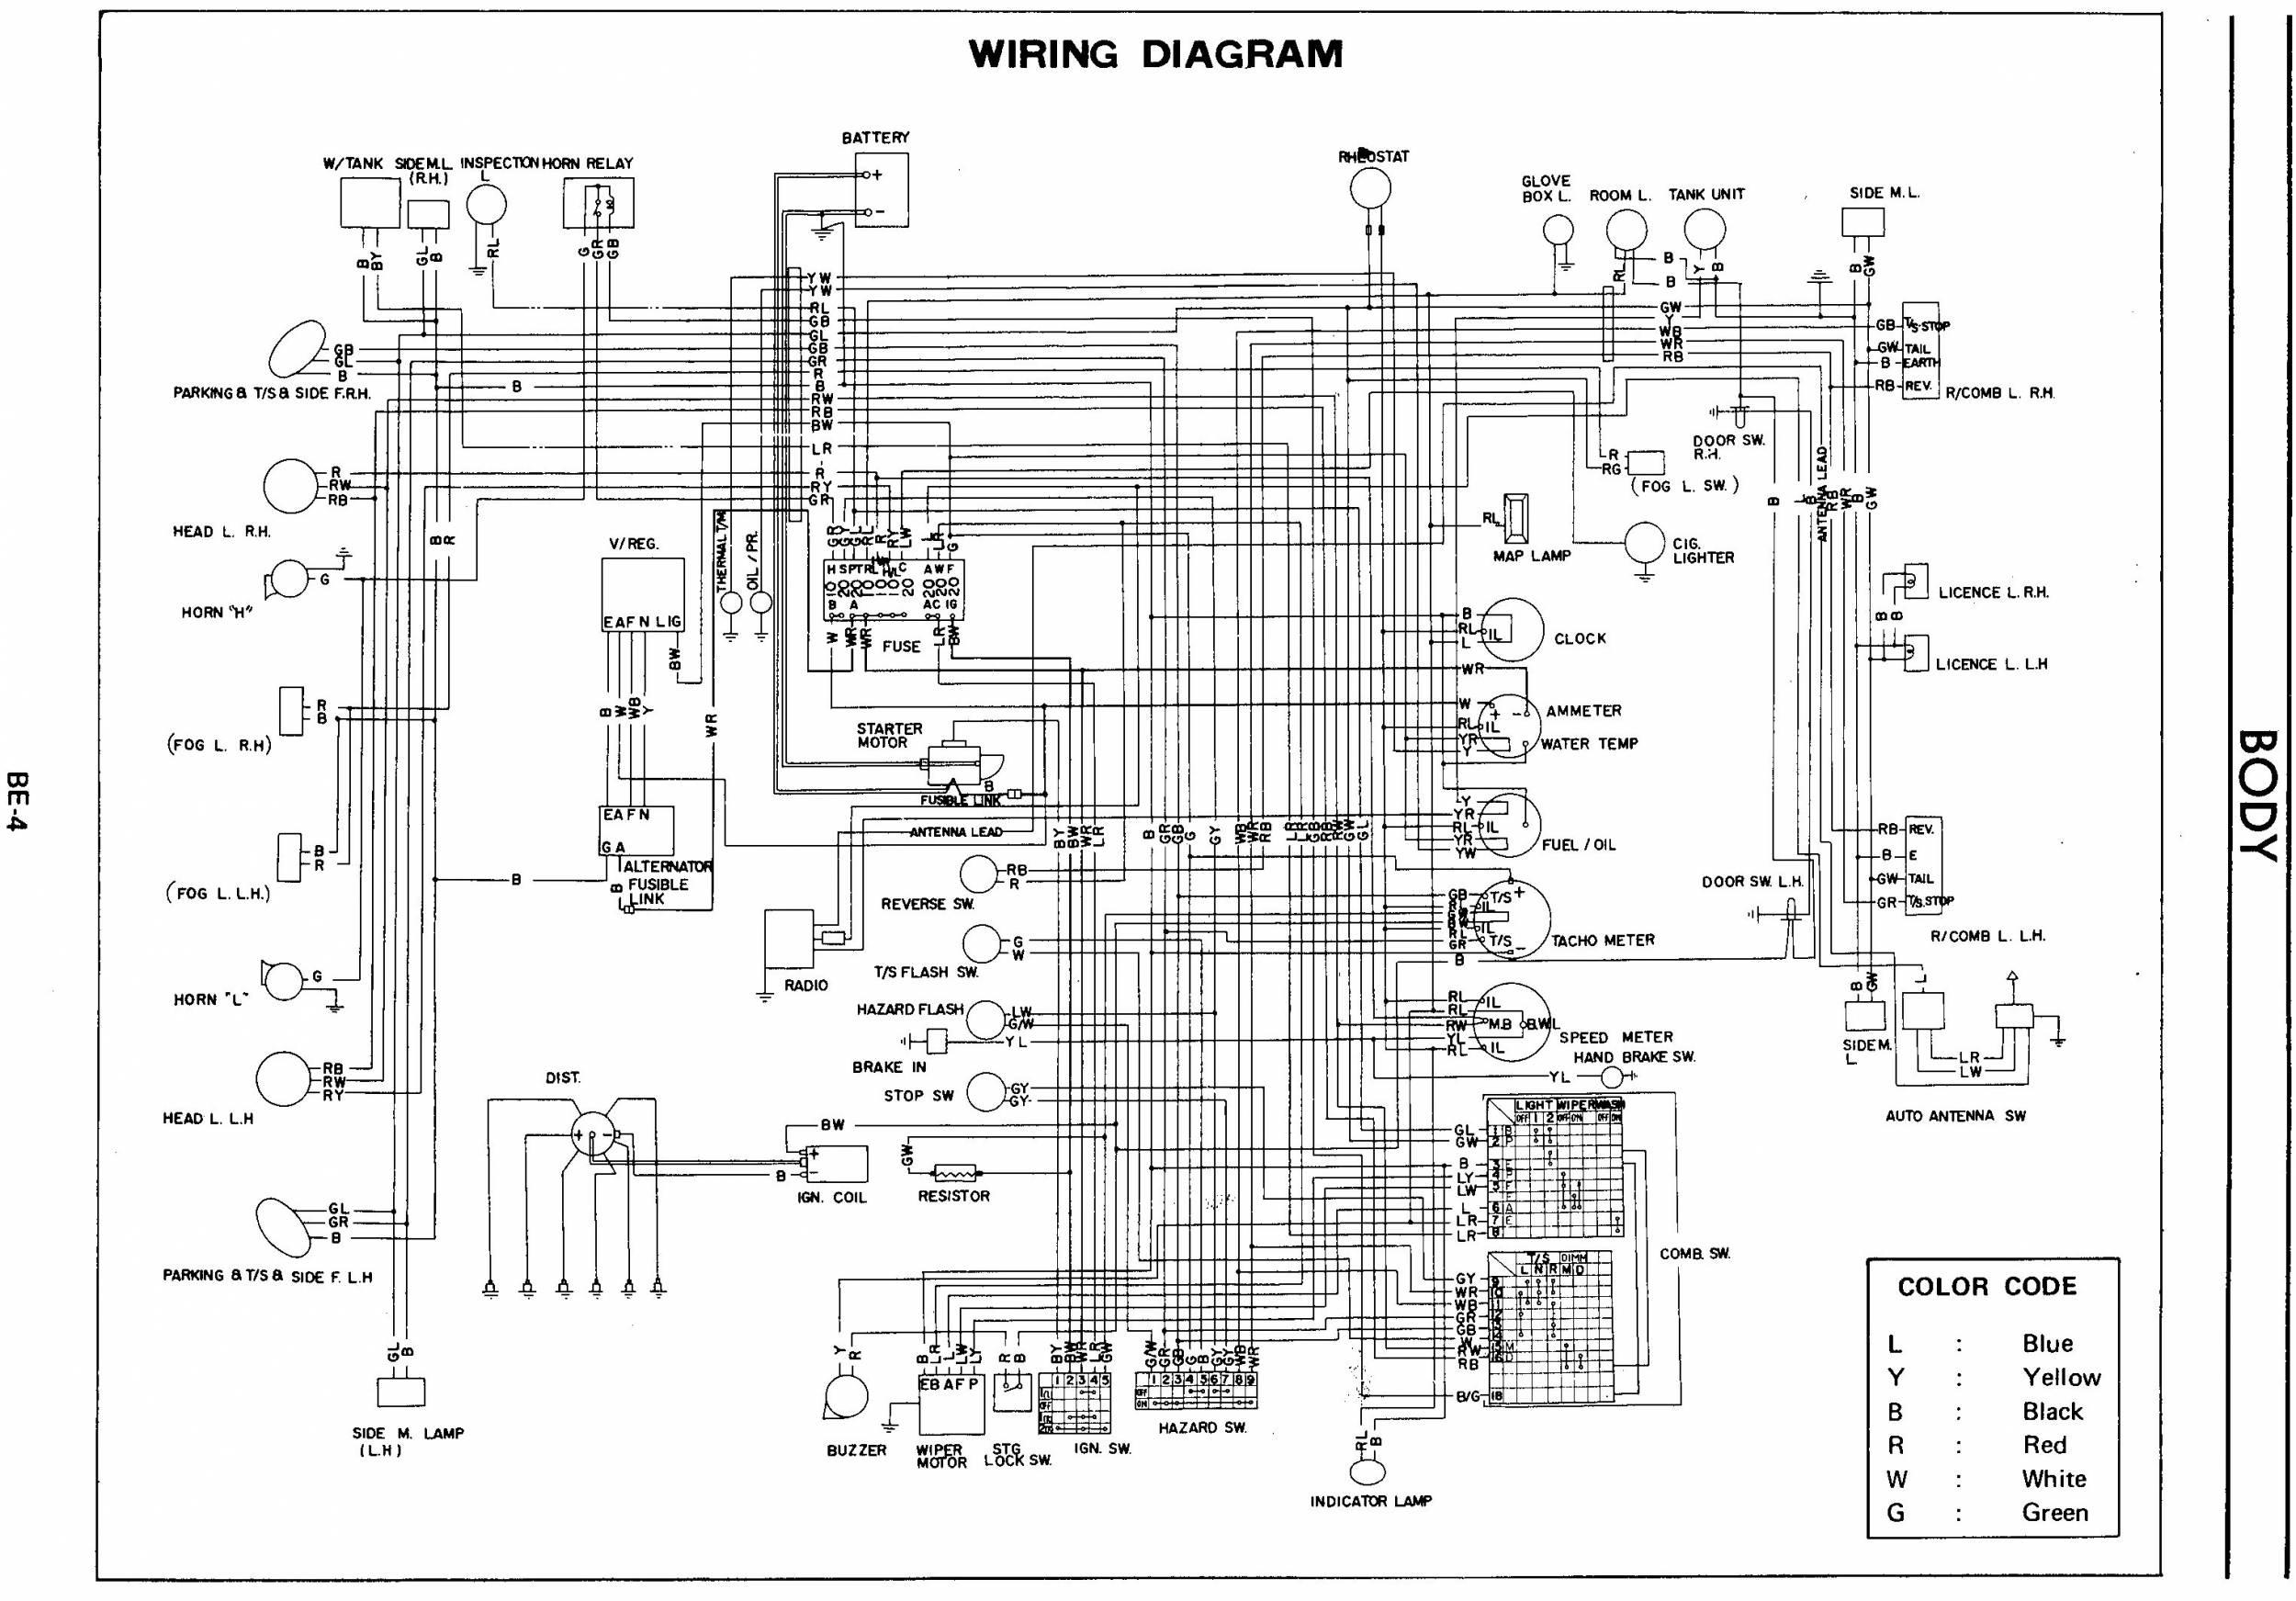 1974 datsun 620 truck wiring diagram